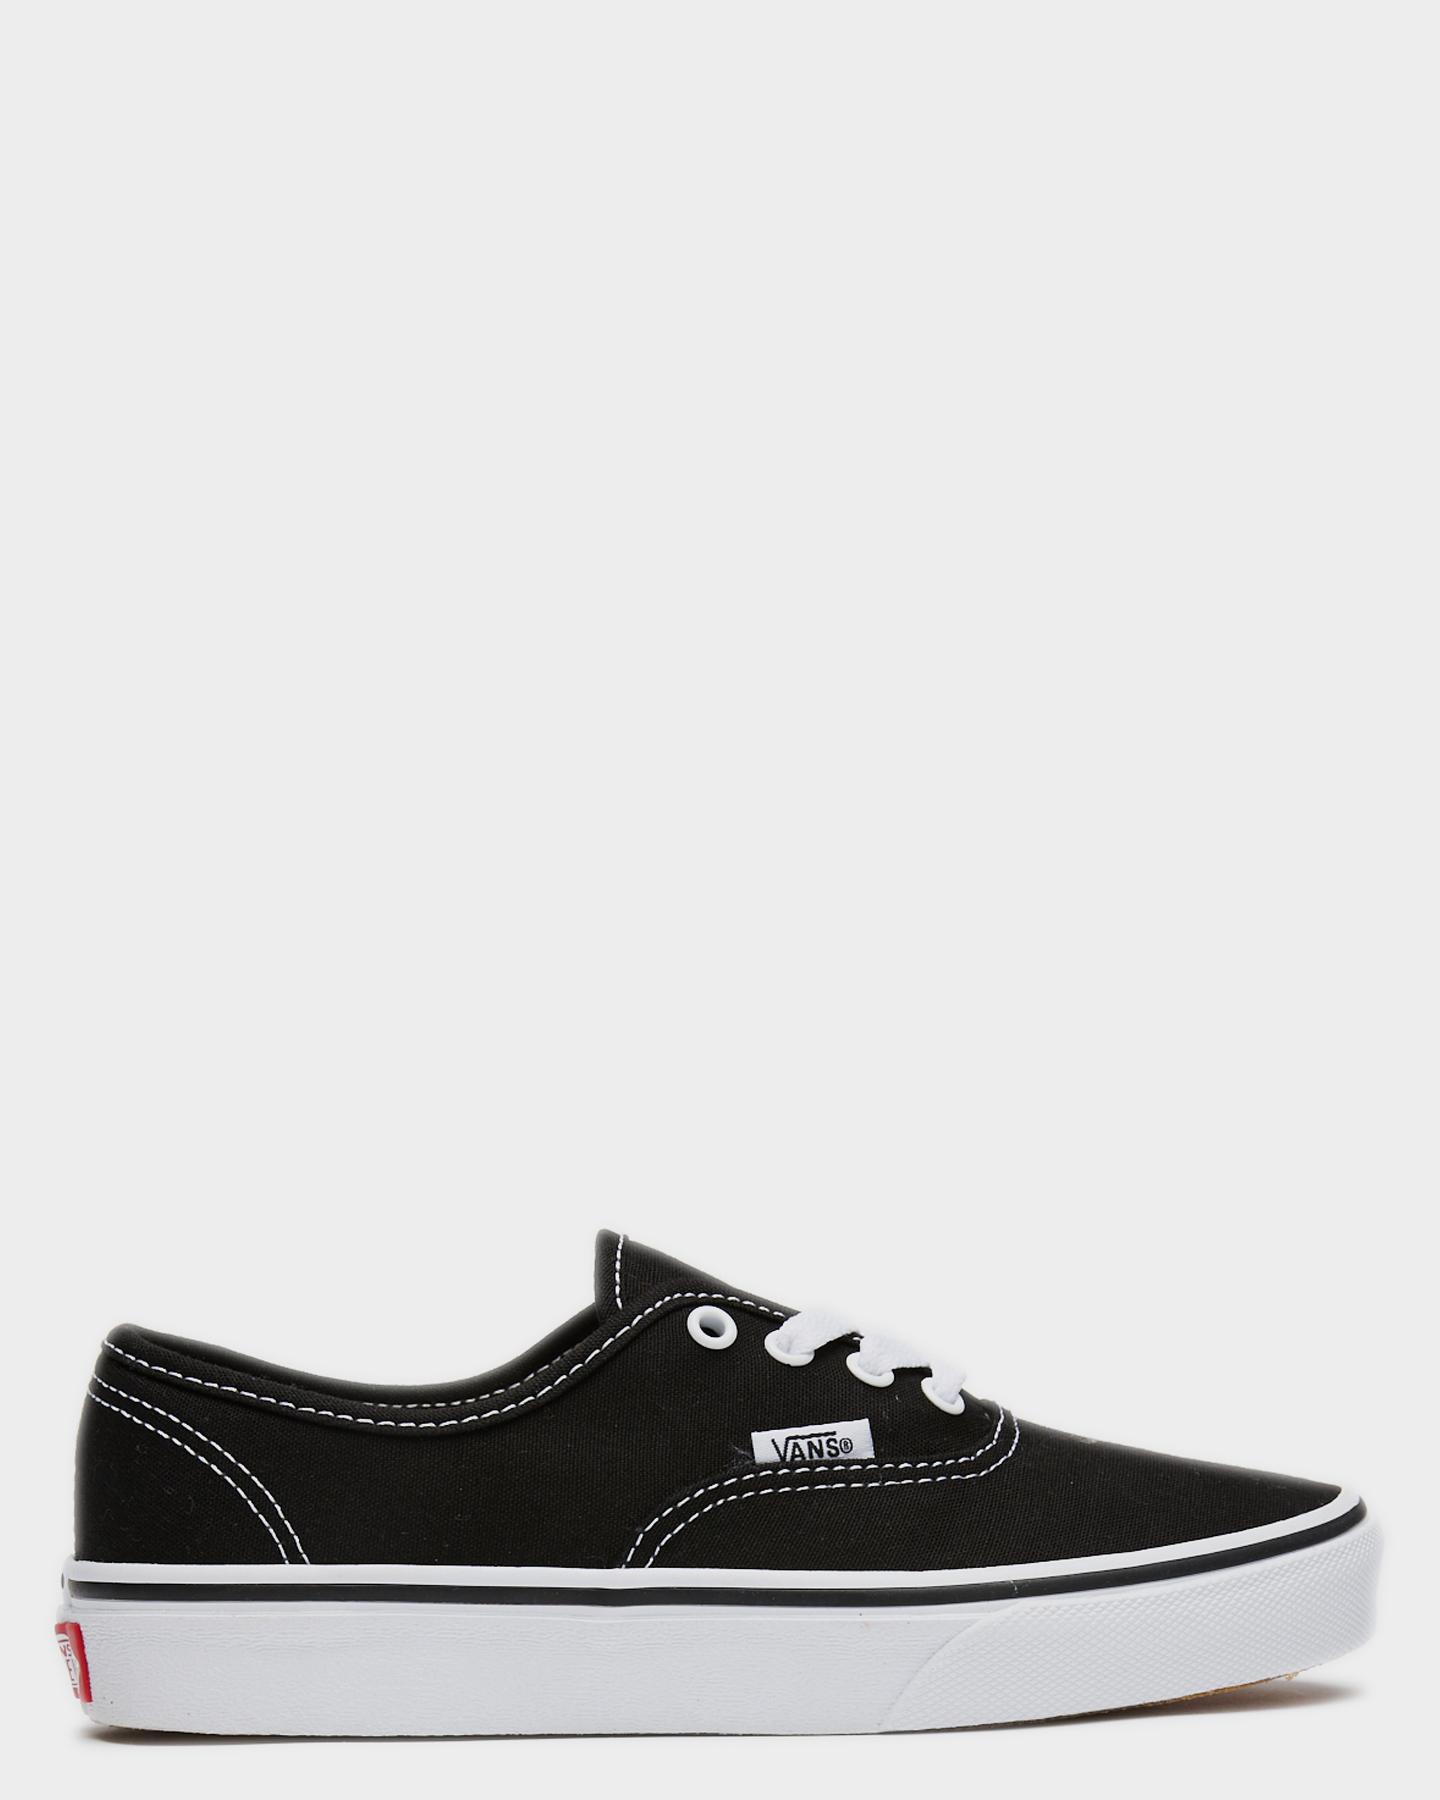 Vans Authentic Shoe - Youth Black White